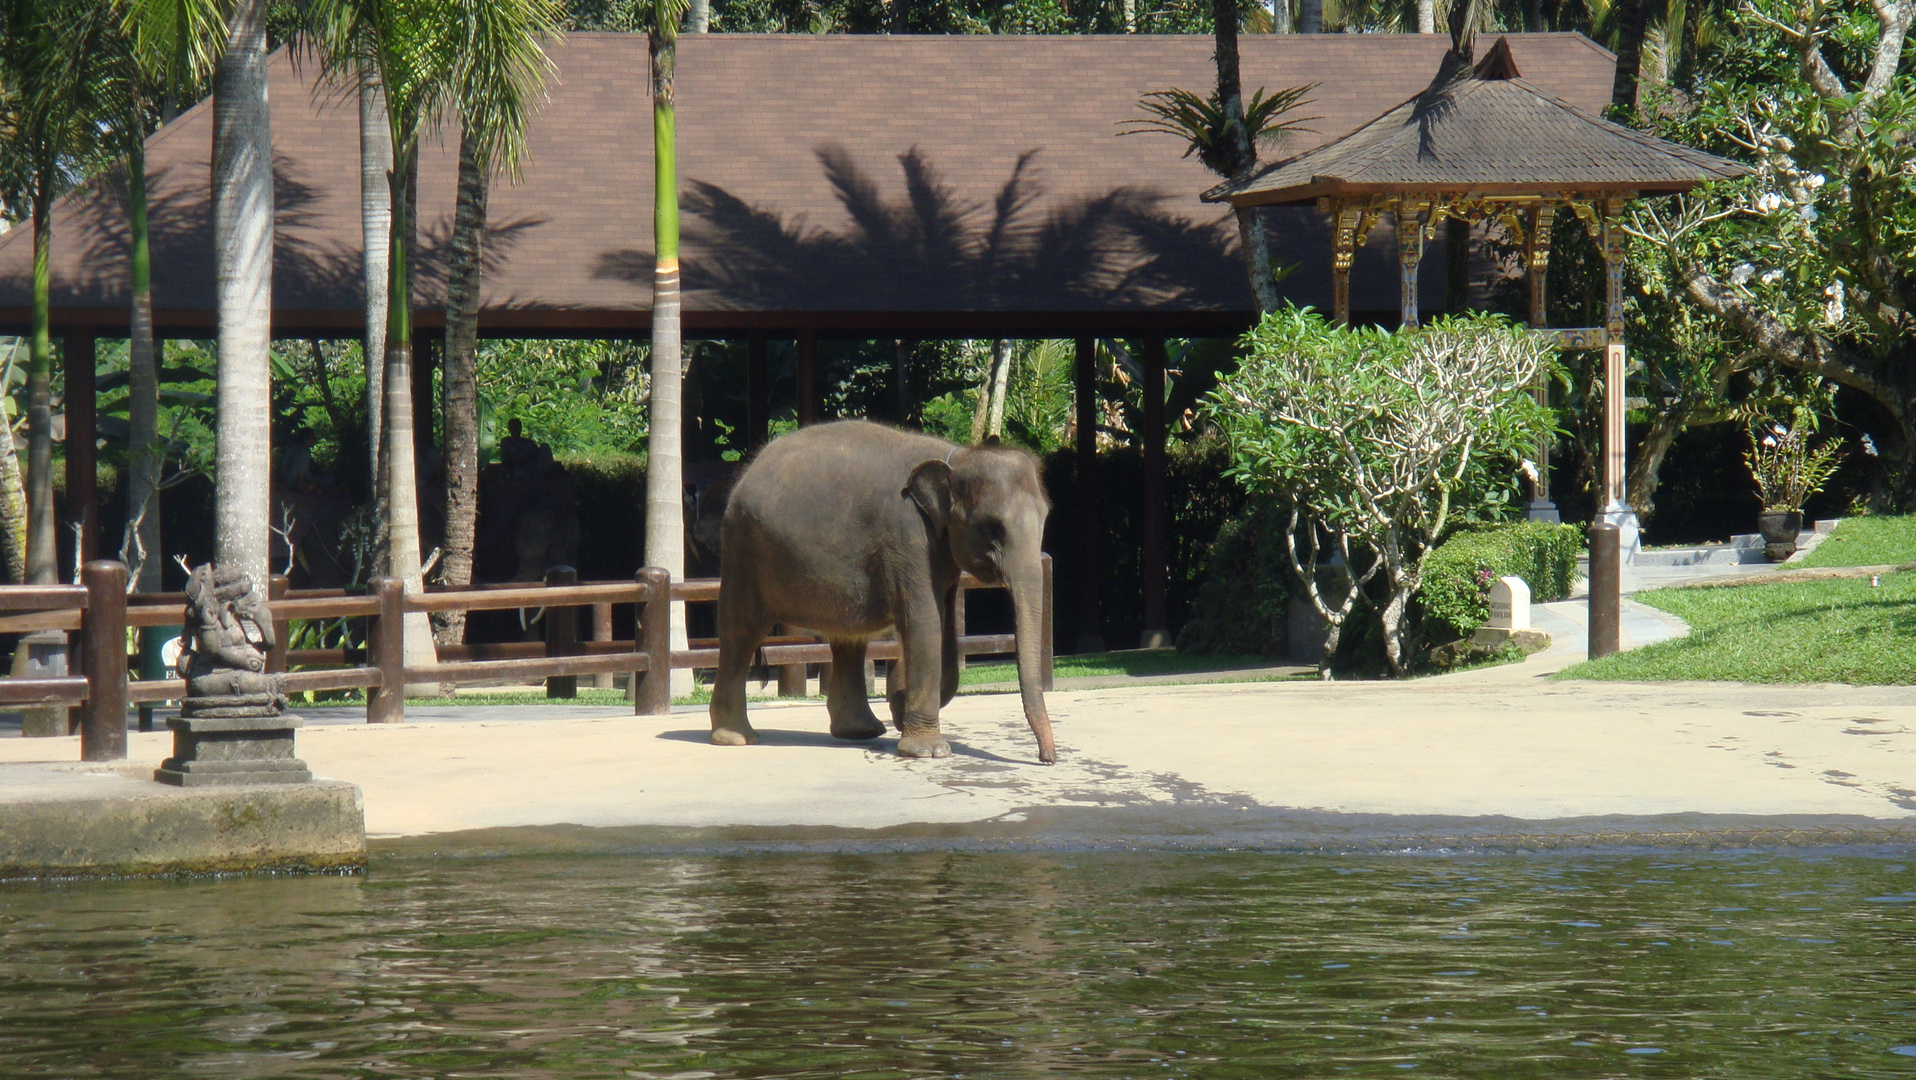 Elefant in Bali